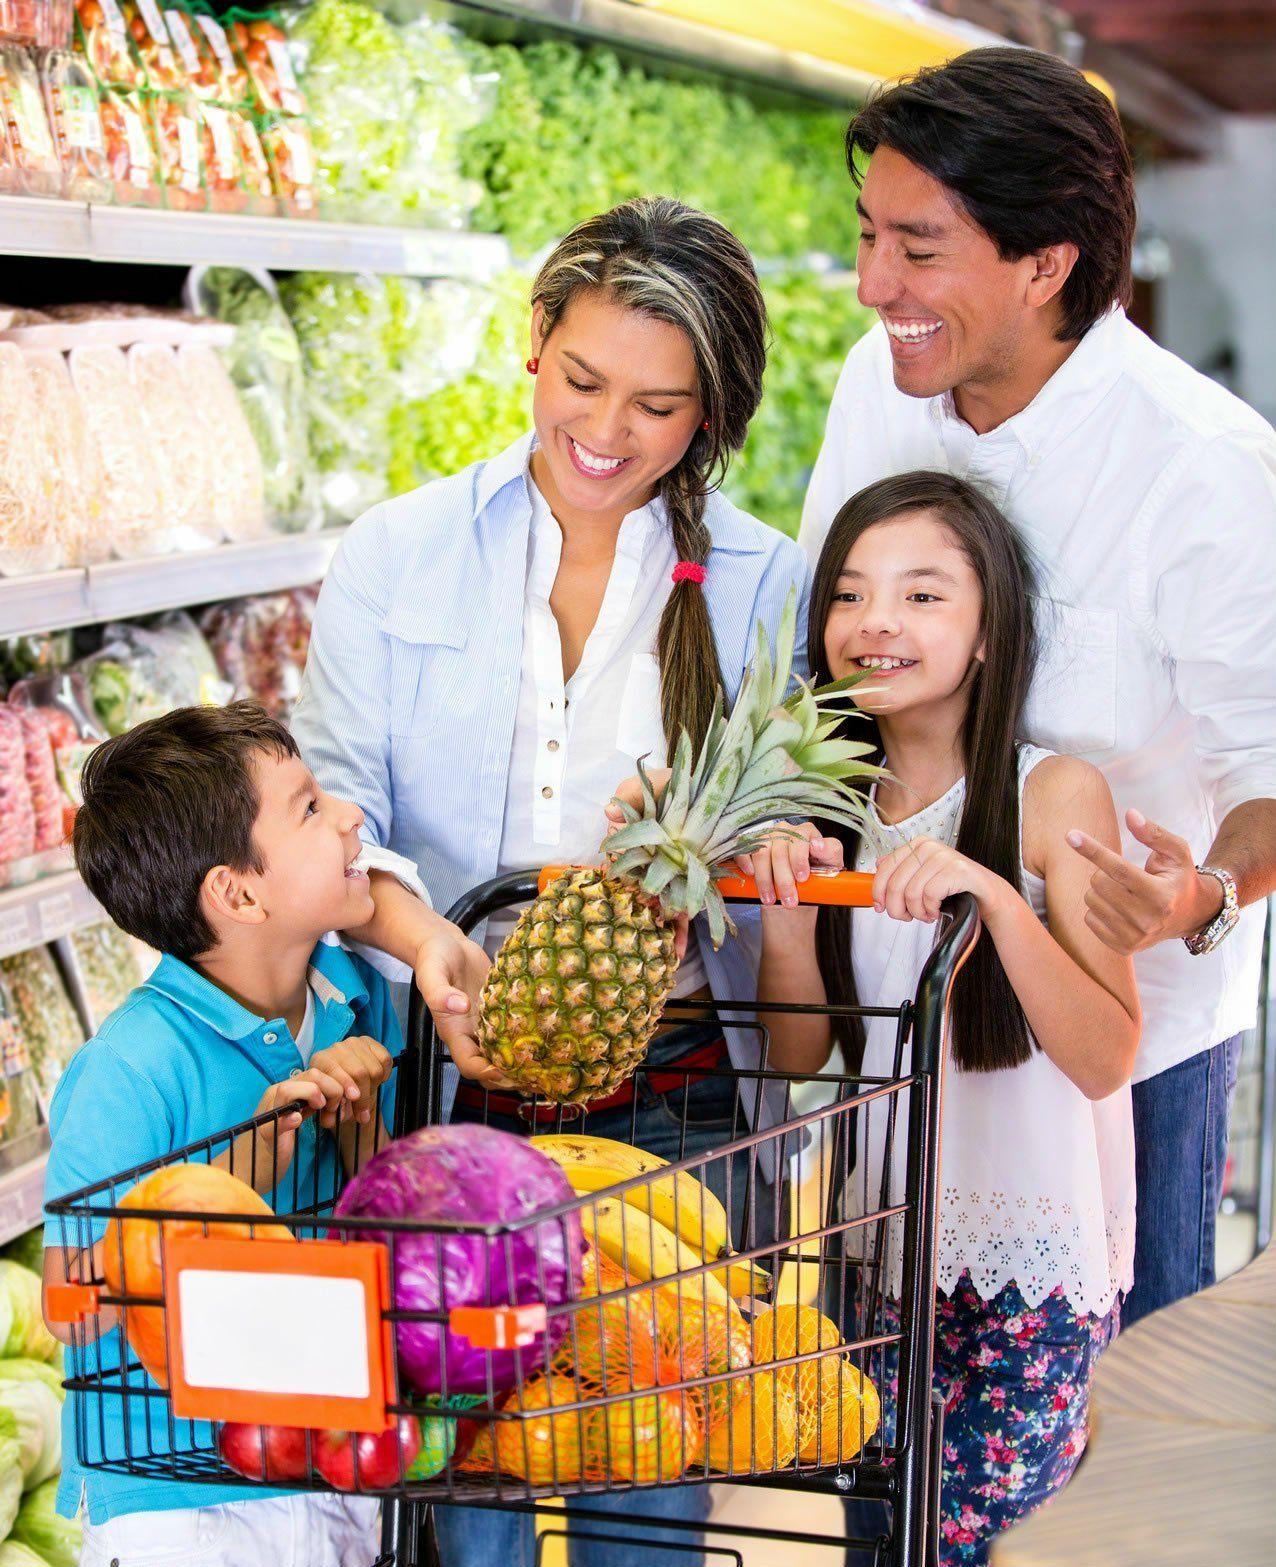 photodune-4167651-happy-family-at-the-supermarket-m-happy-family